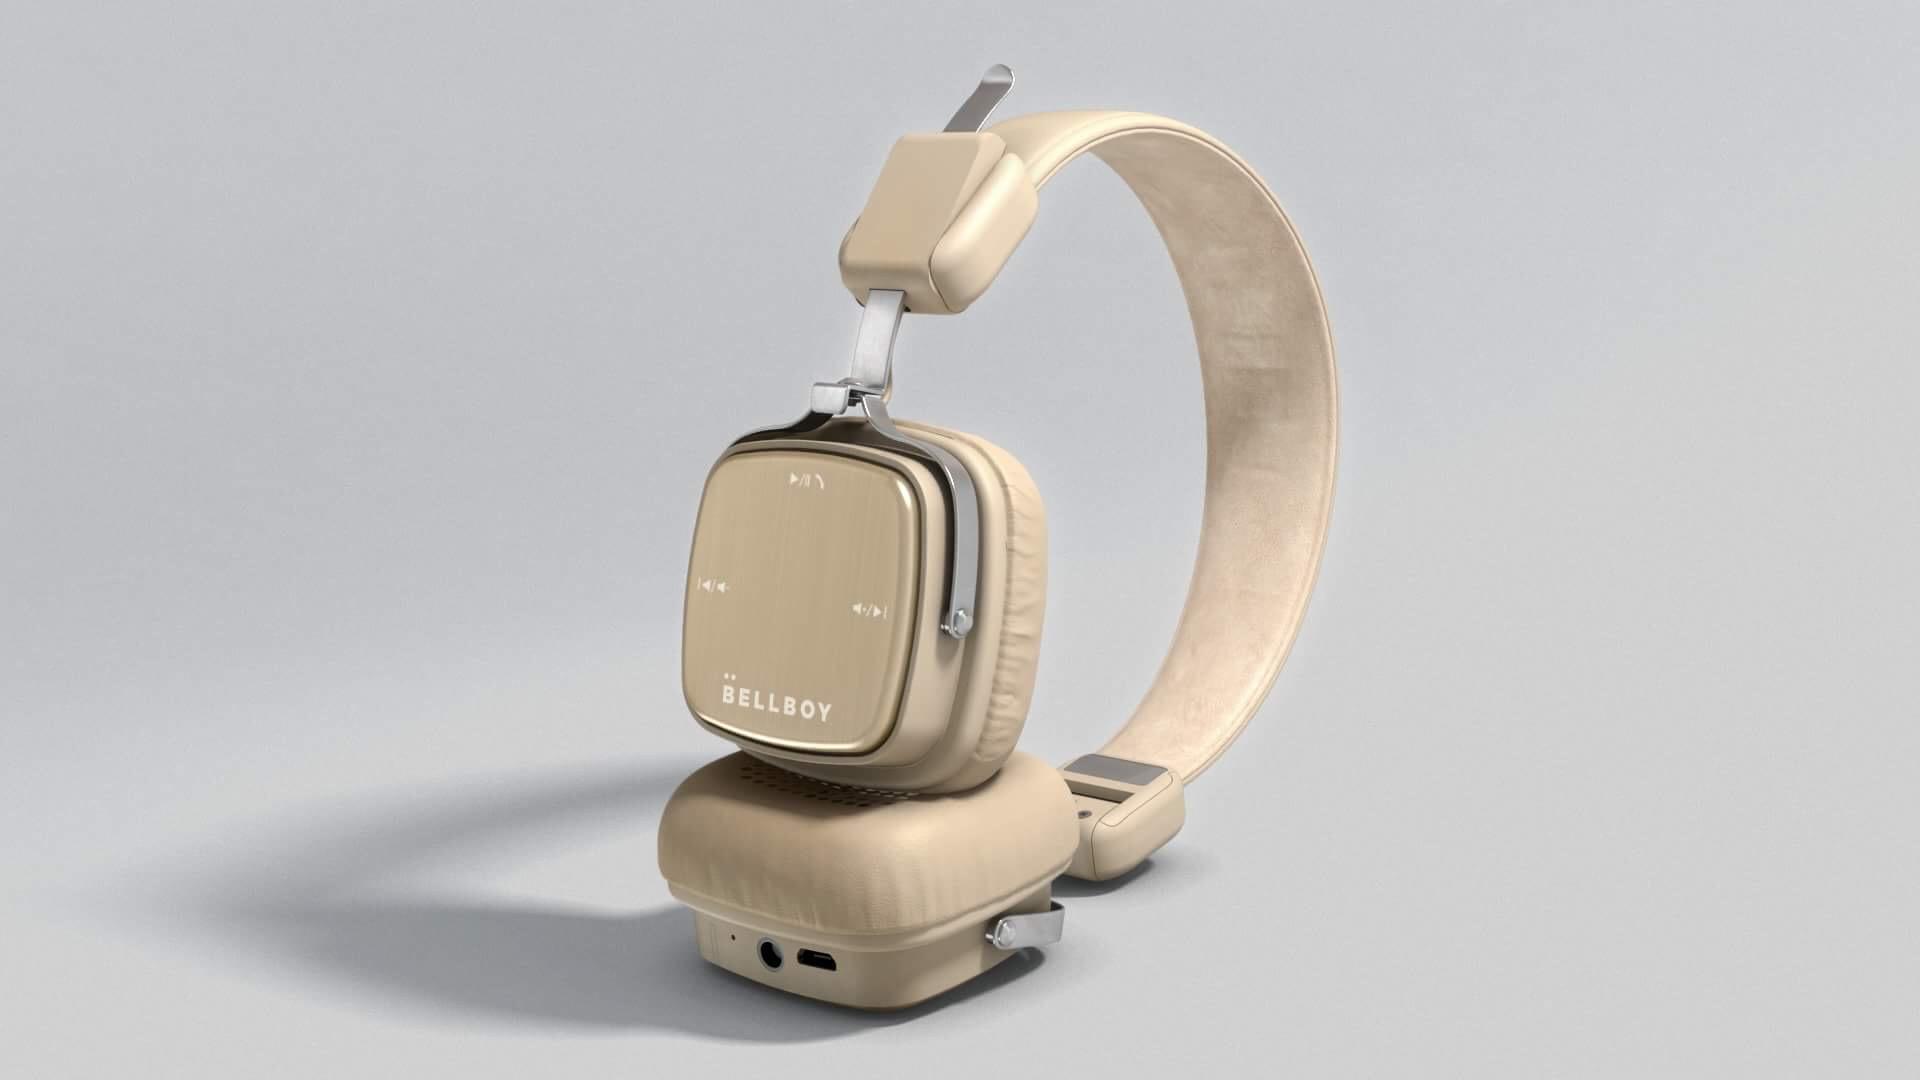 bellboy bluetooth headphones review 15 techora. Black Bedroom Furniture Sets. Home Design Ideas